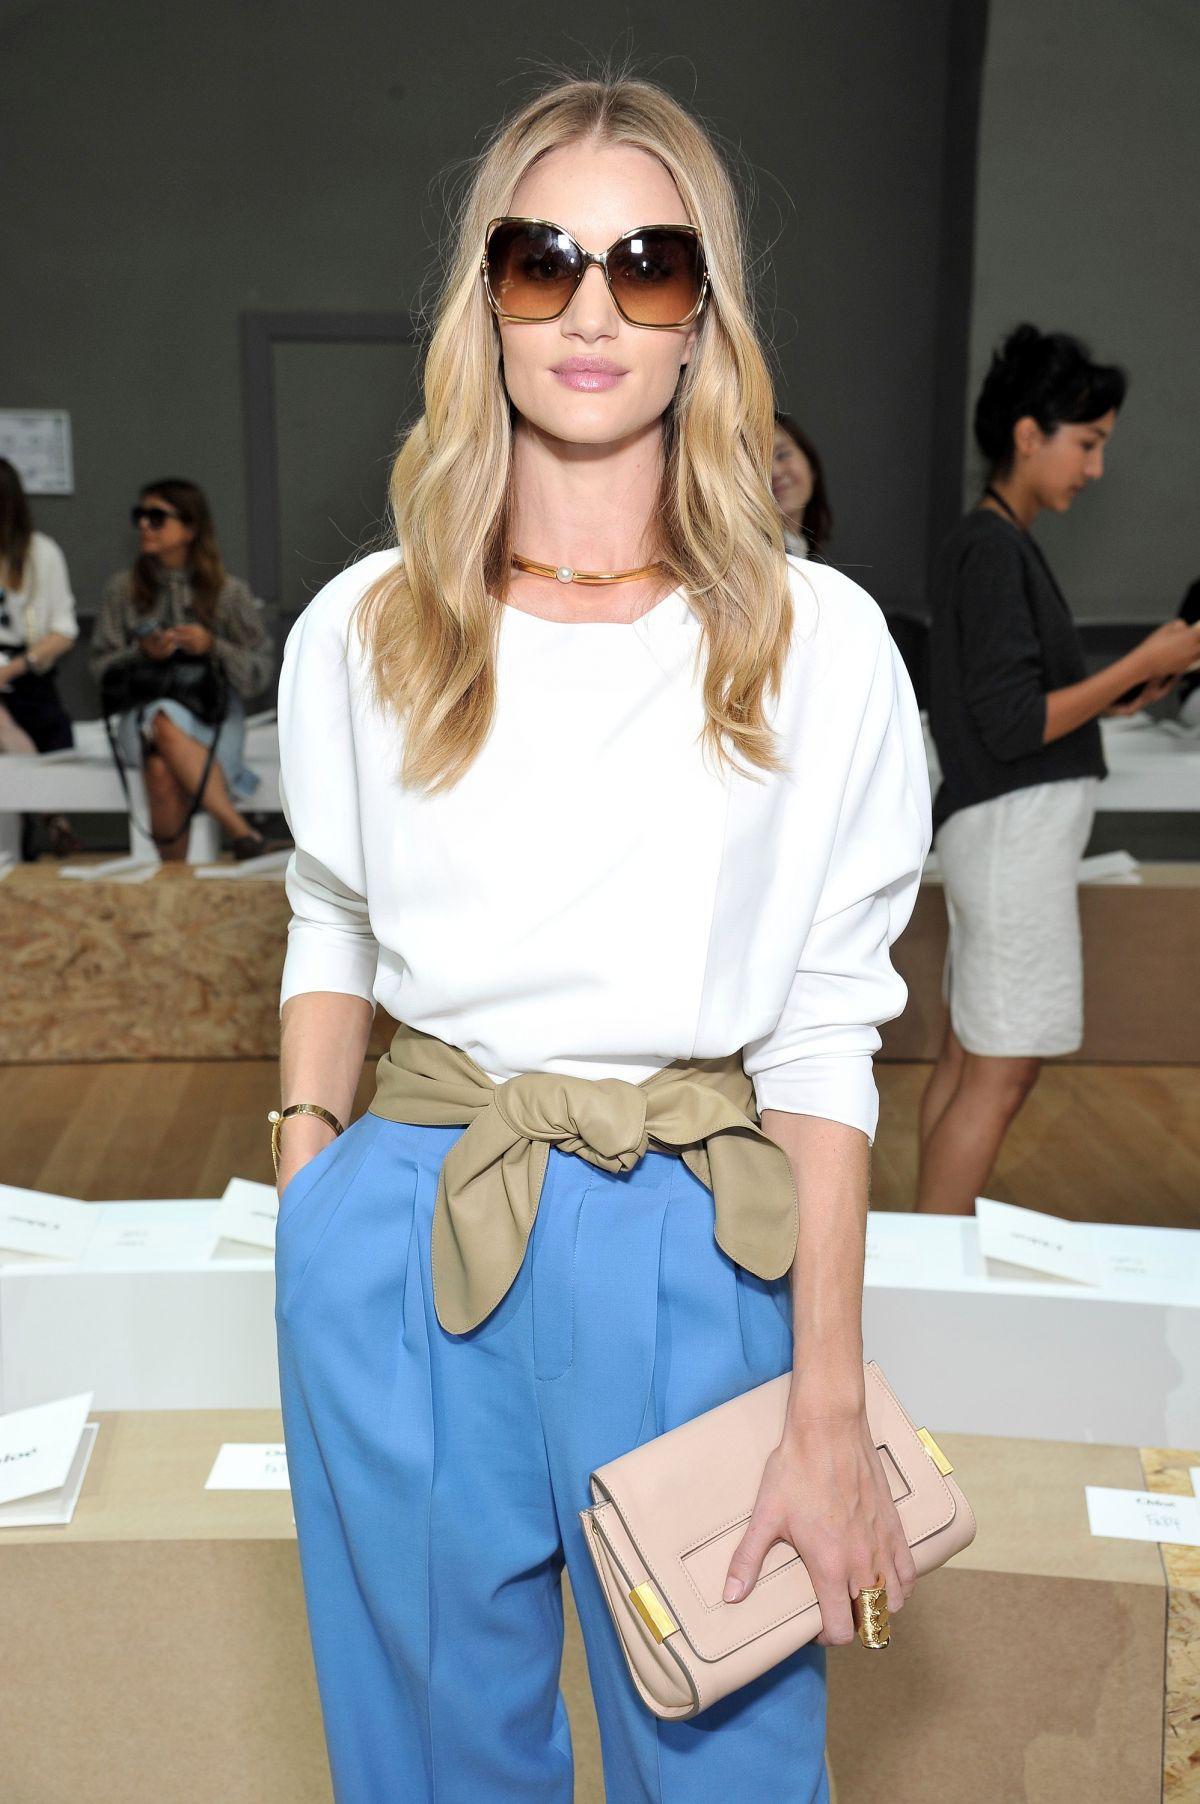 ROSIE HUNTINGTON-WHITELEY at Chloe Show at Paris Fashion Week